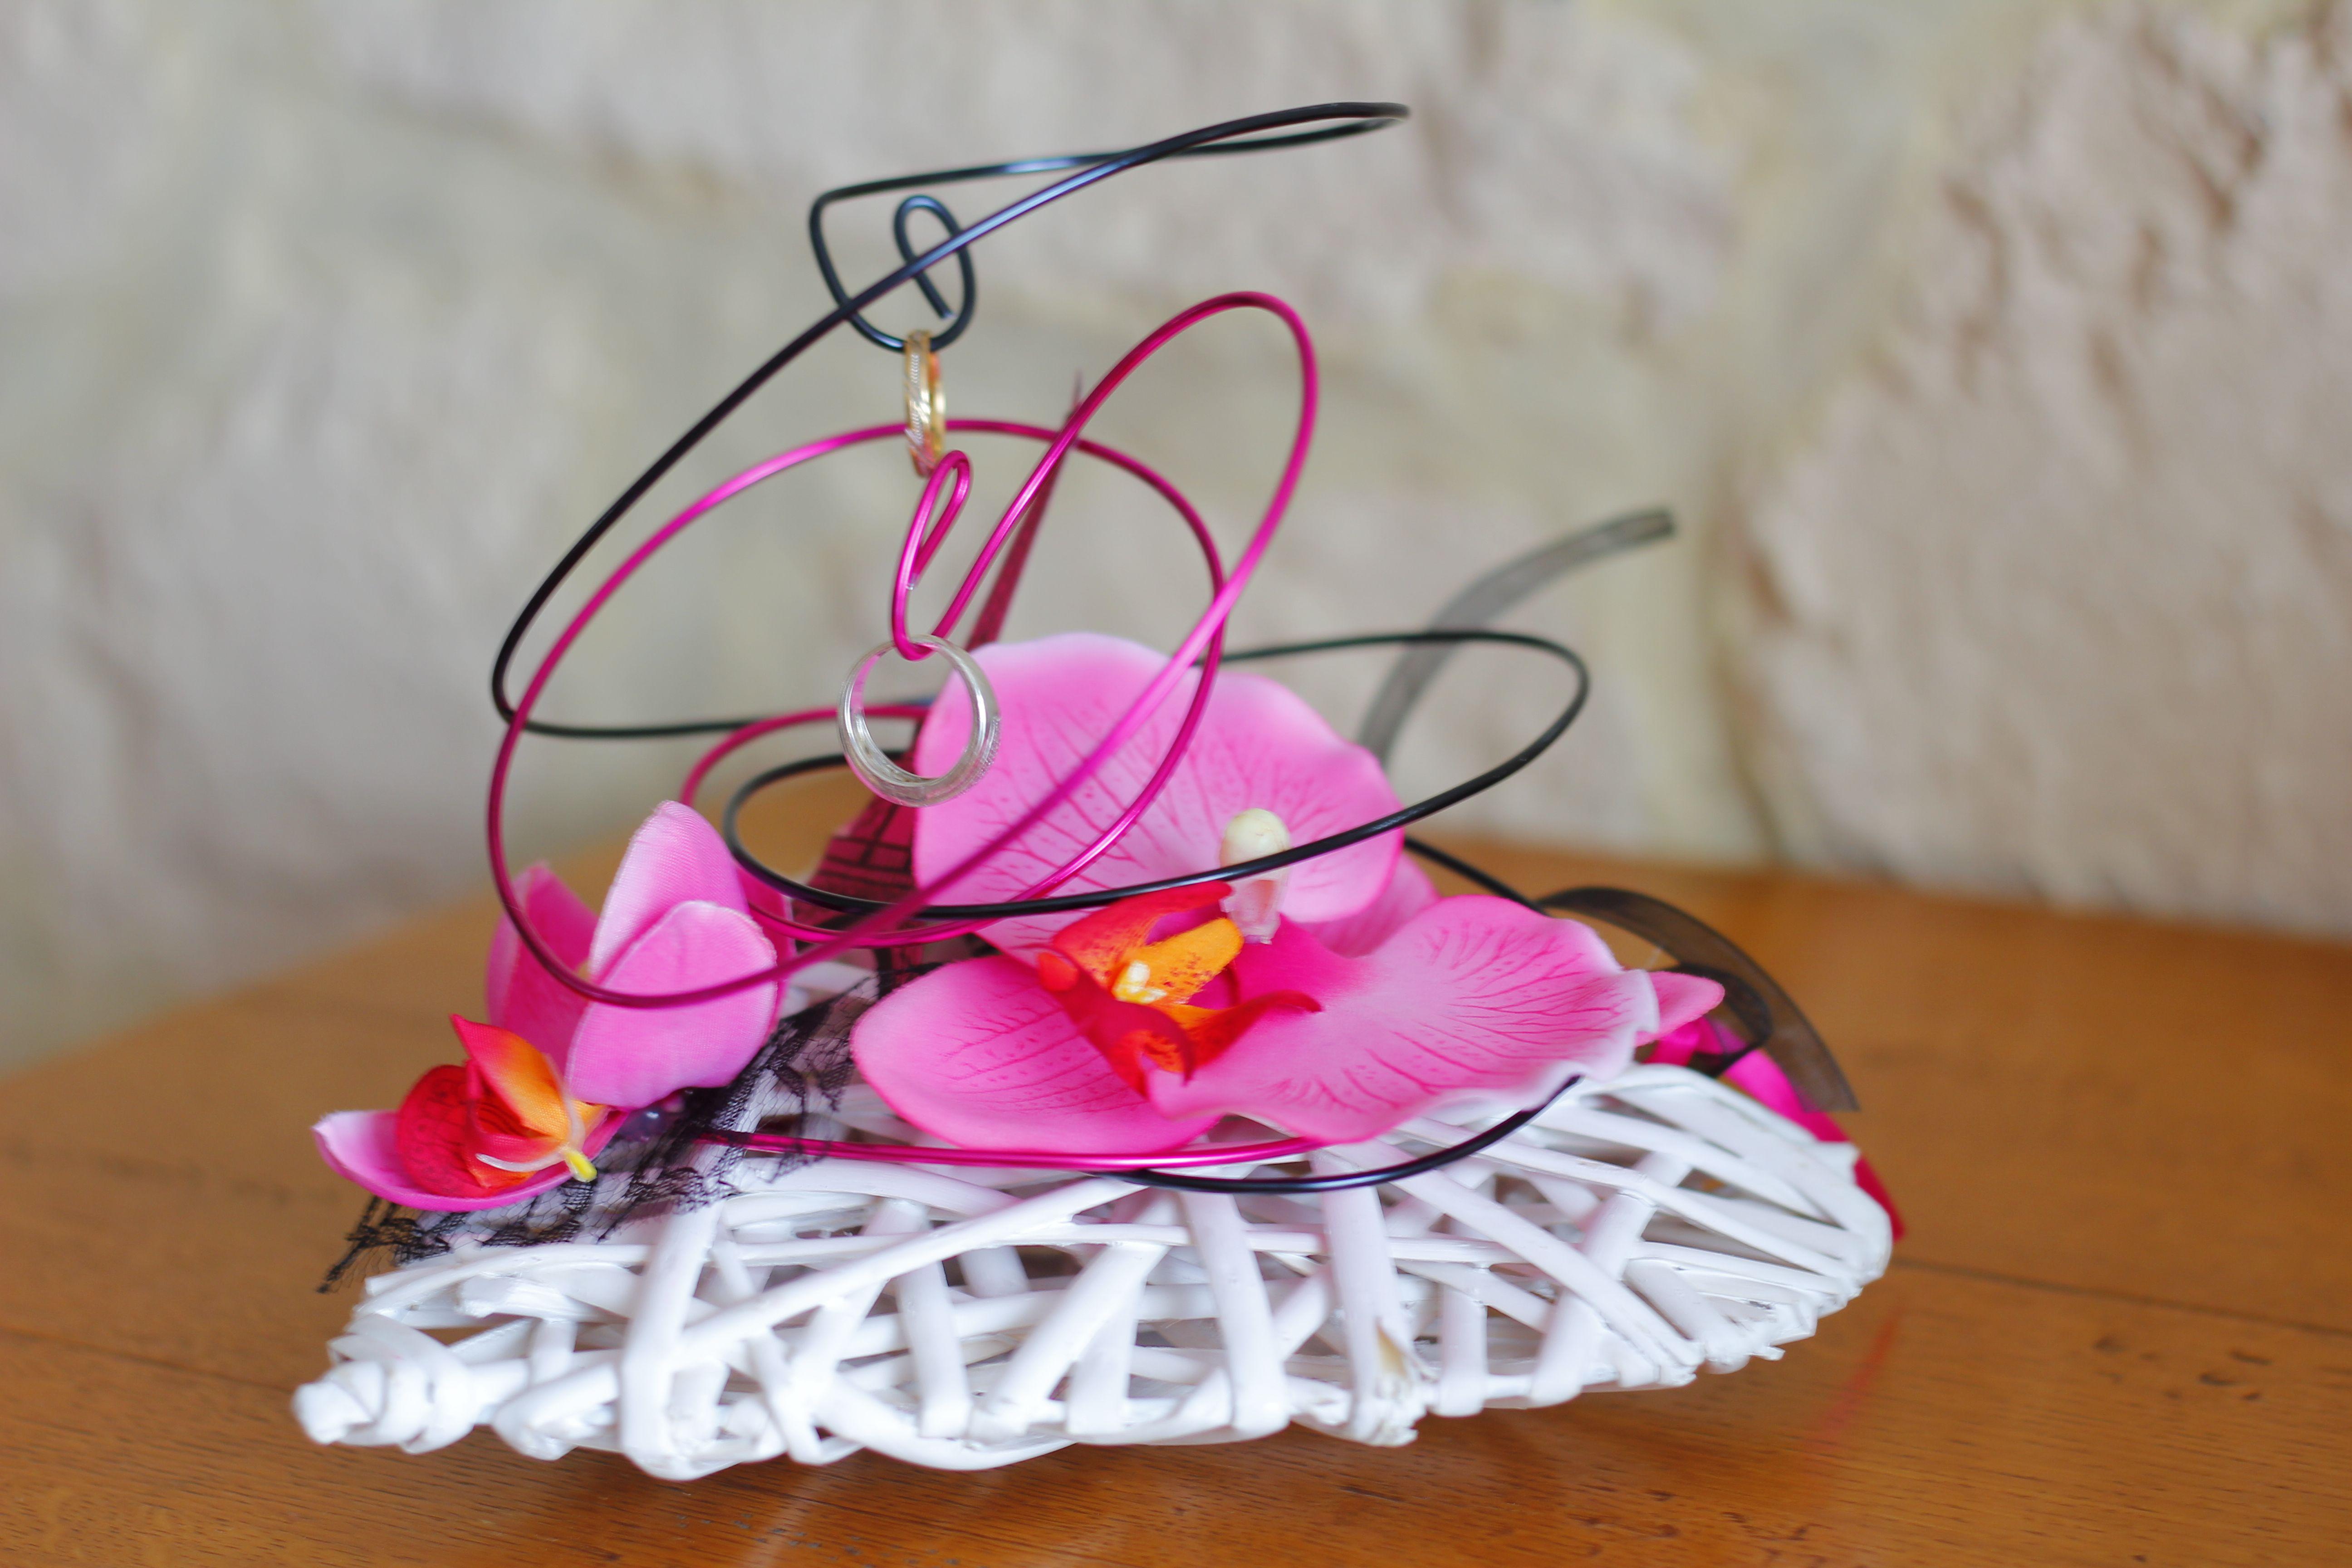 Pin by Sandra Maboitadeco Noet on Porte alliances | Pinterest